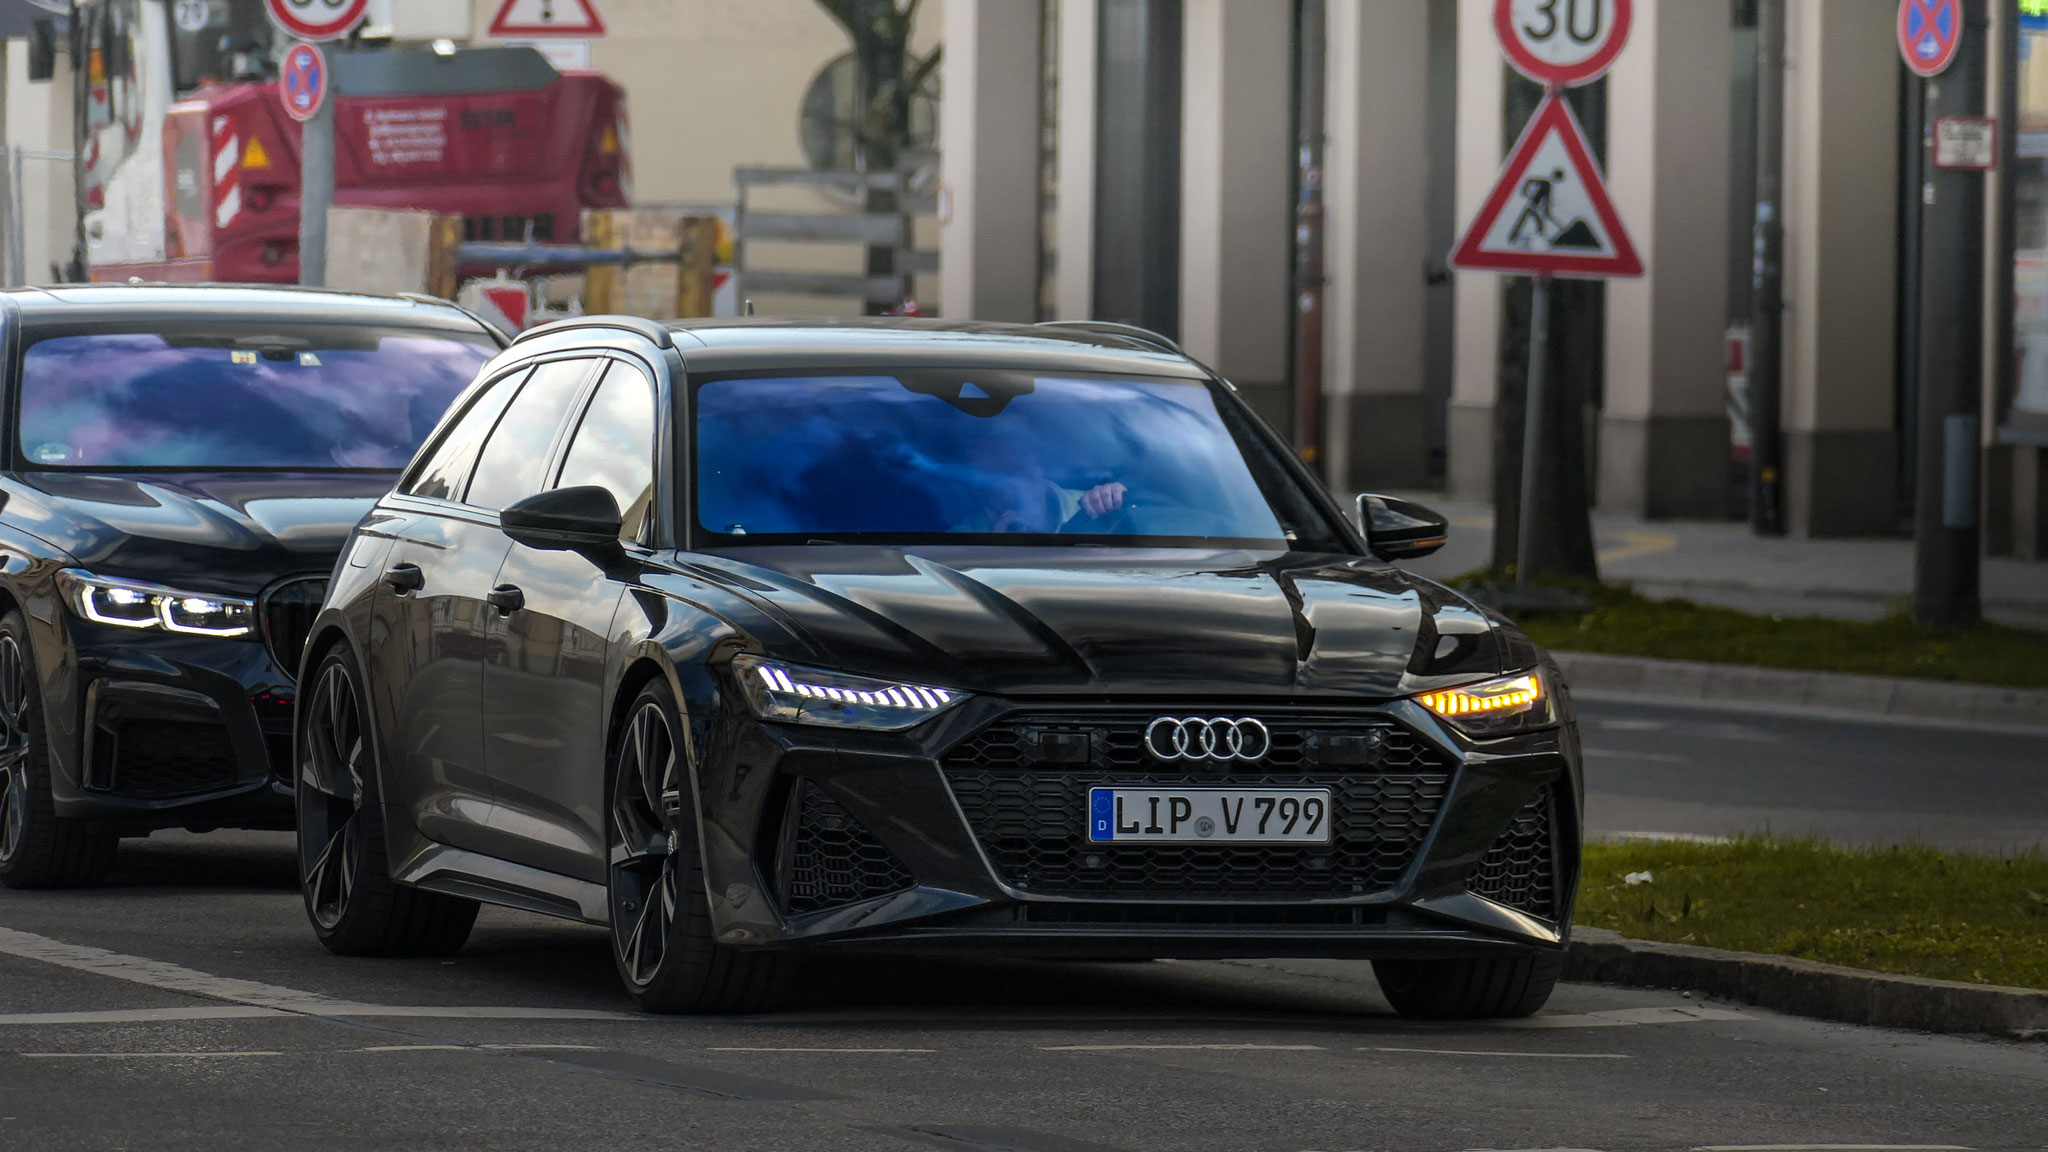 Audi RS6 - LIP-V-799